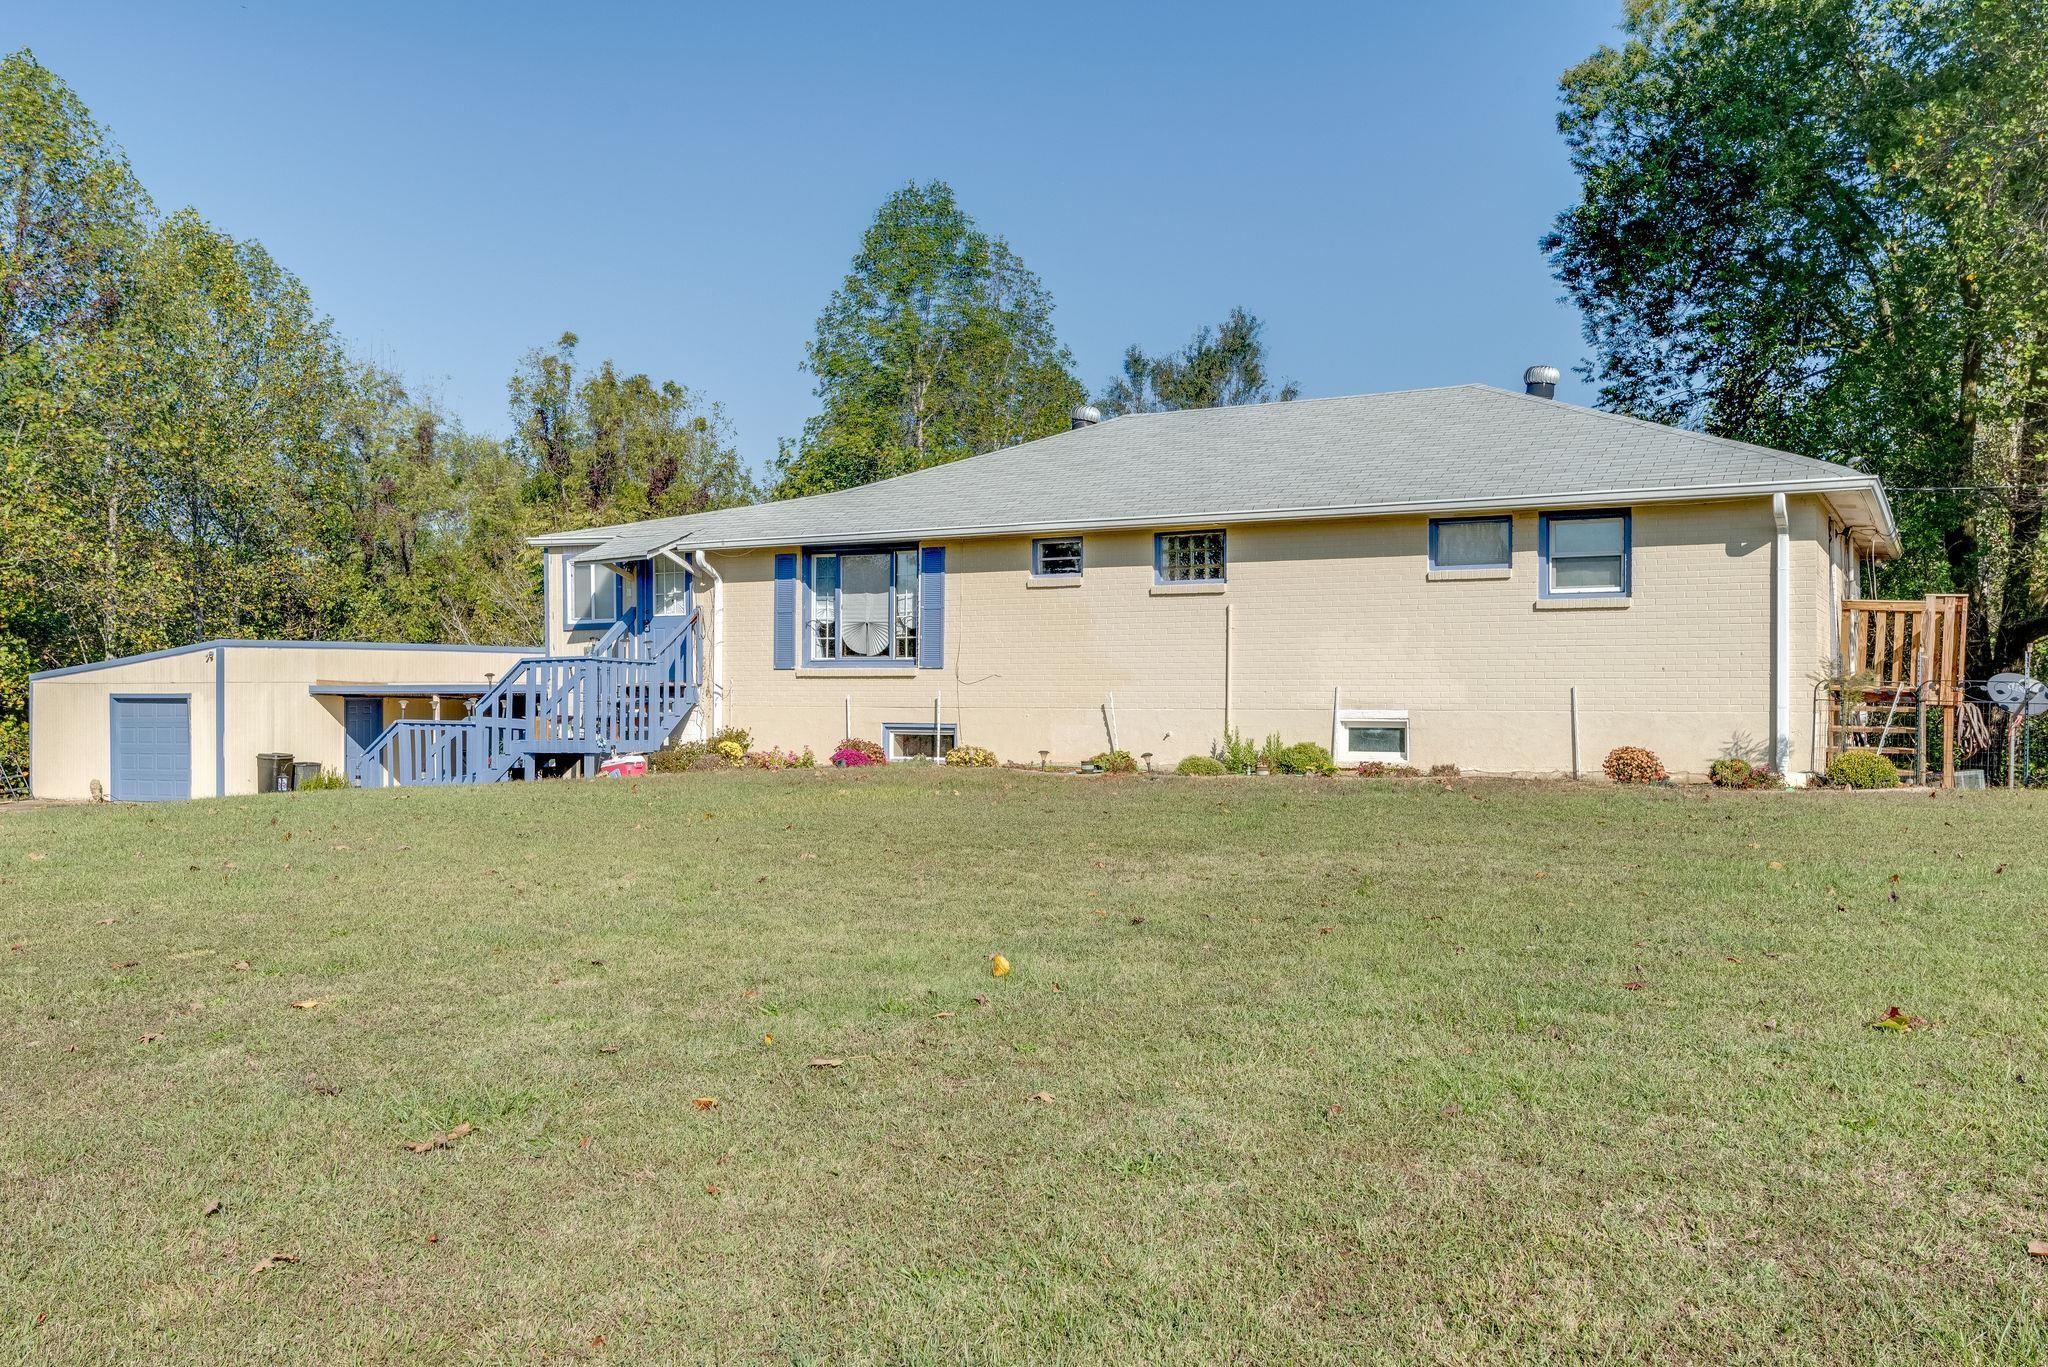 616 Danley Rd, Charlotte, TN 37036 - Charlotte, TN real estate listing